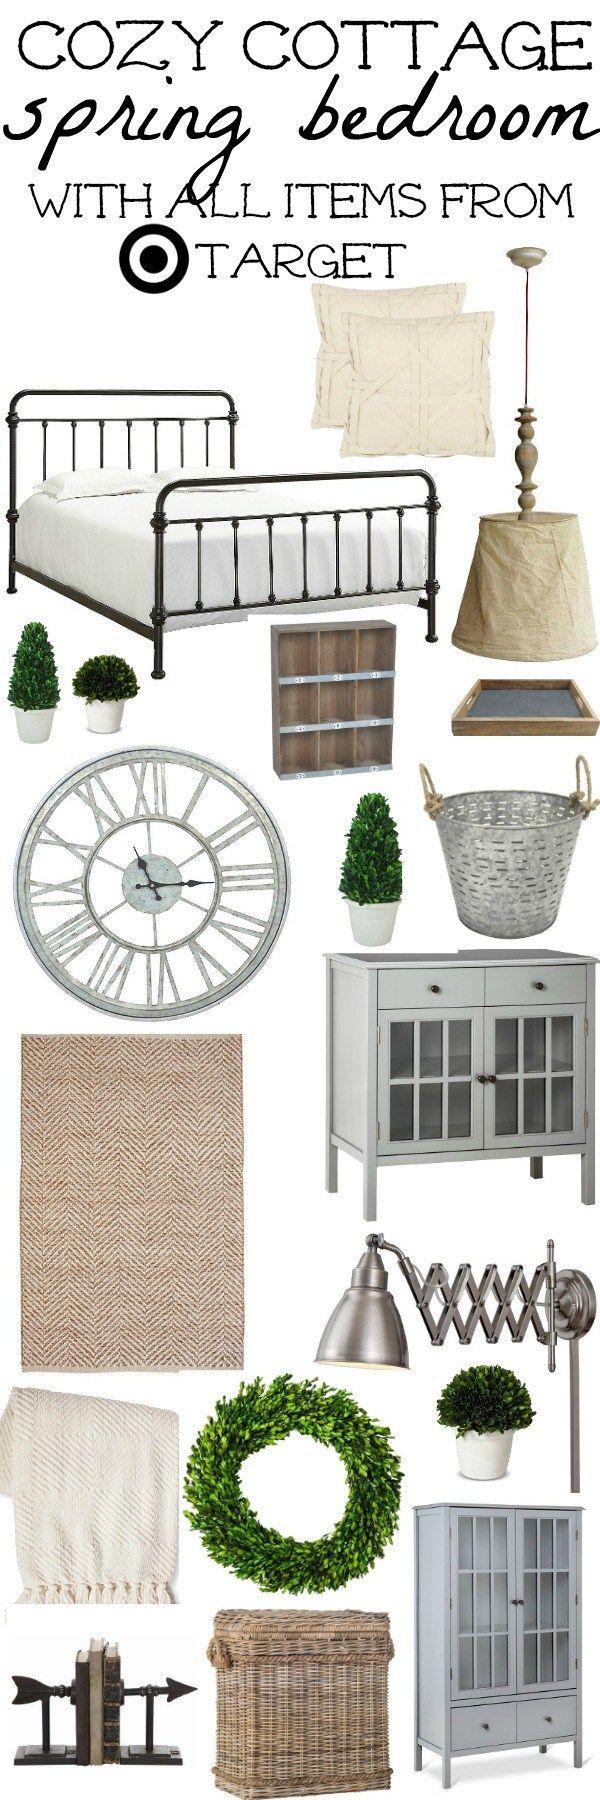 bedroom items. Cozy Cottage Spring Bedroom Design Best 25  bedrooms ideas on Pinterest Beach cottage